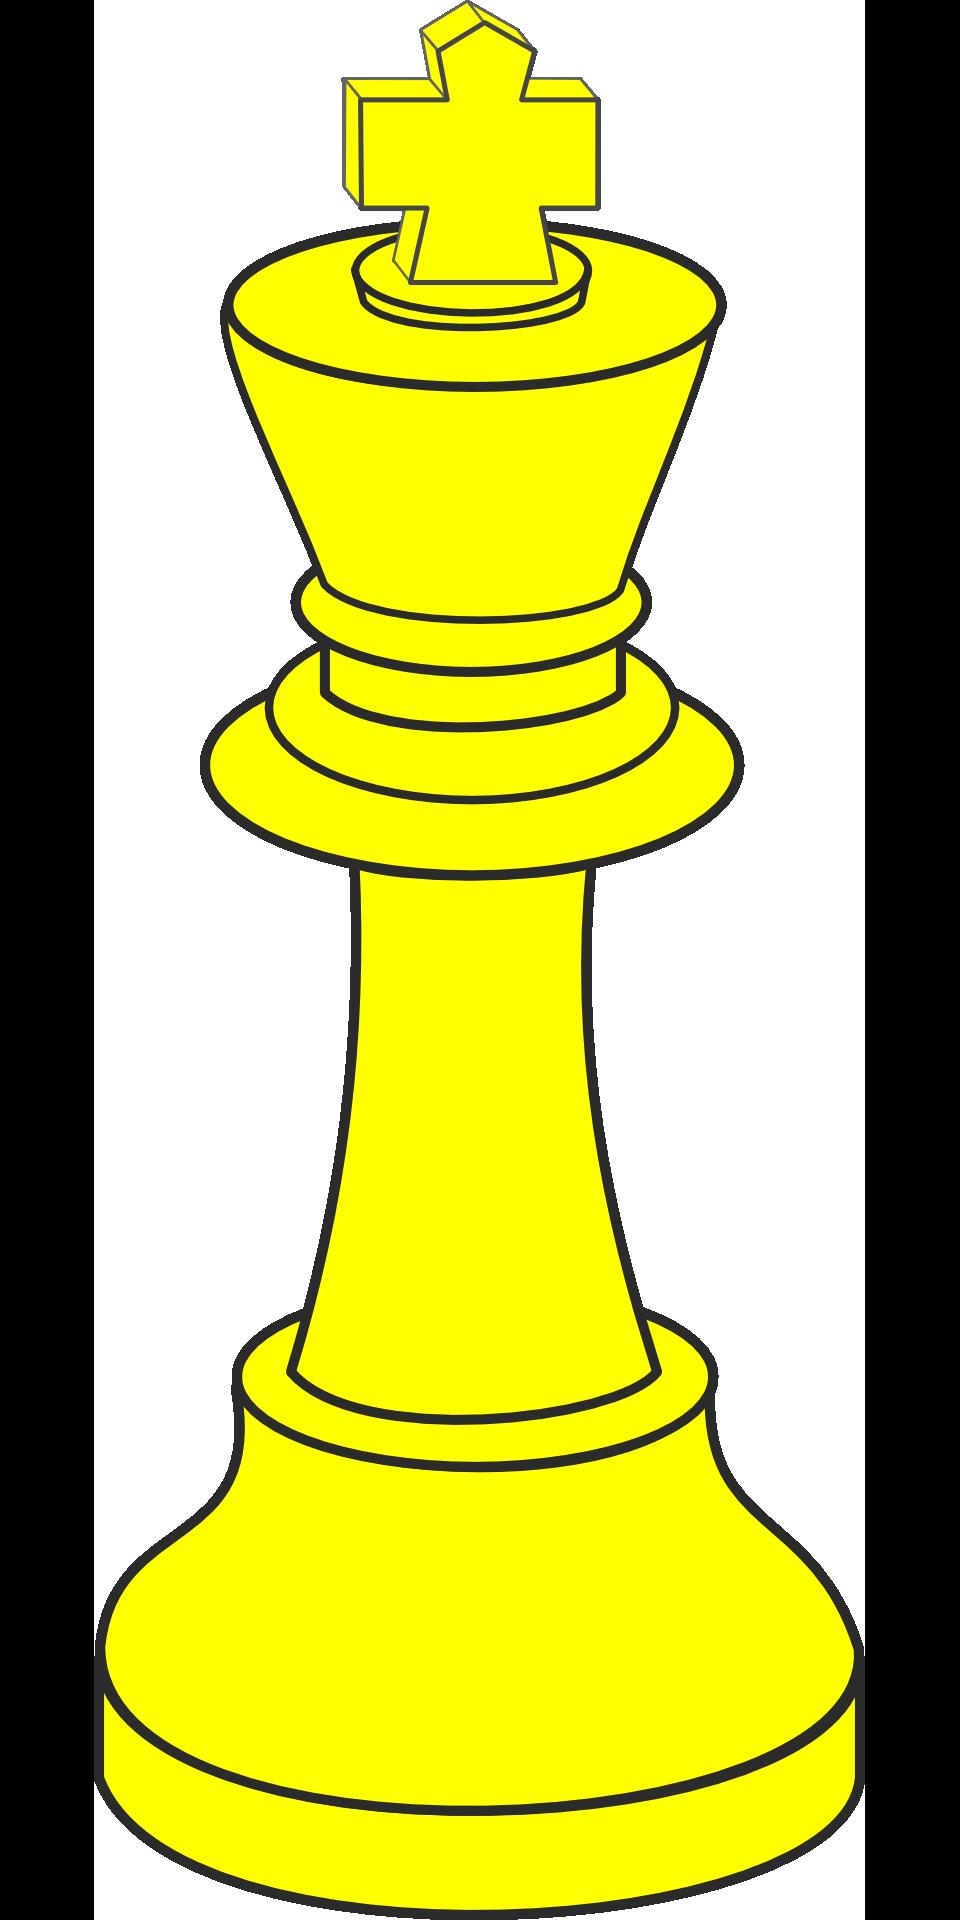 Chess piece queen clip. King clipart queenclip